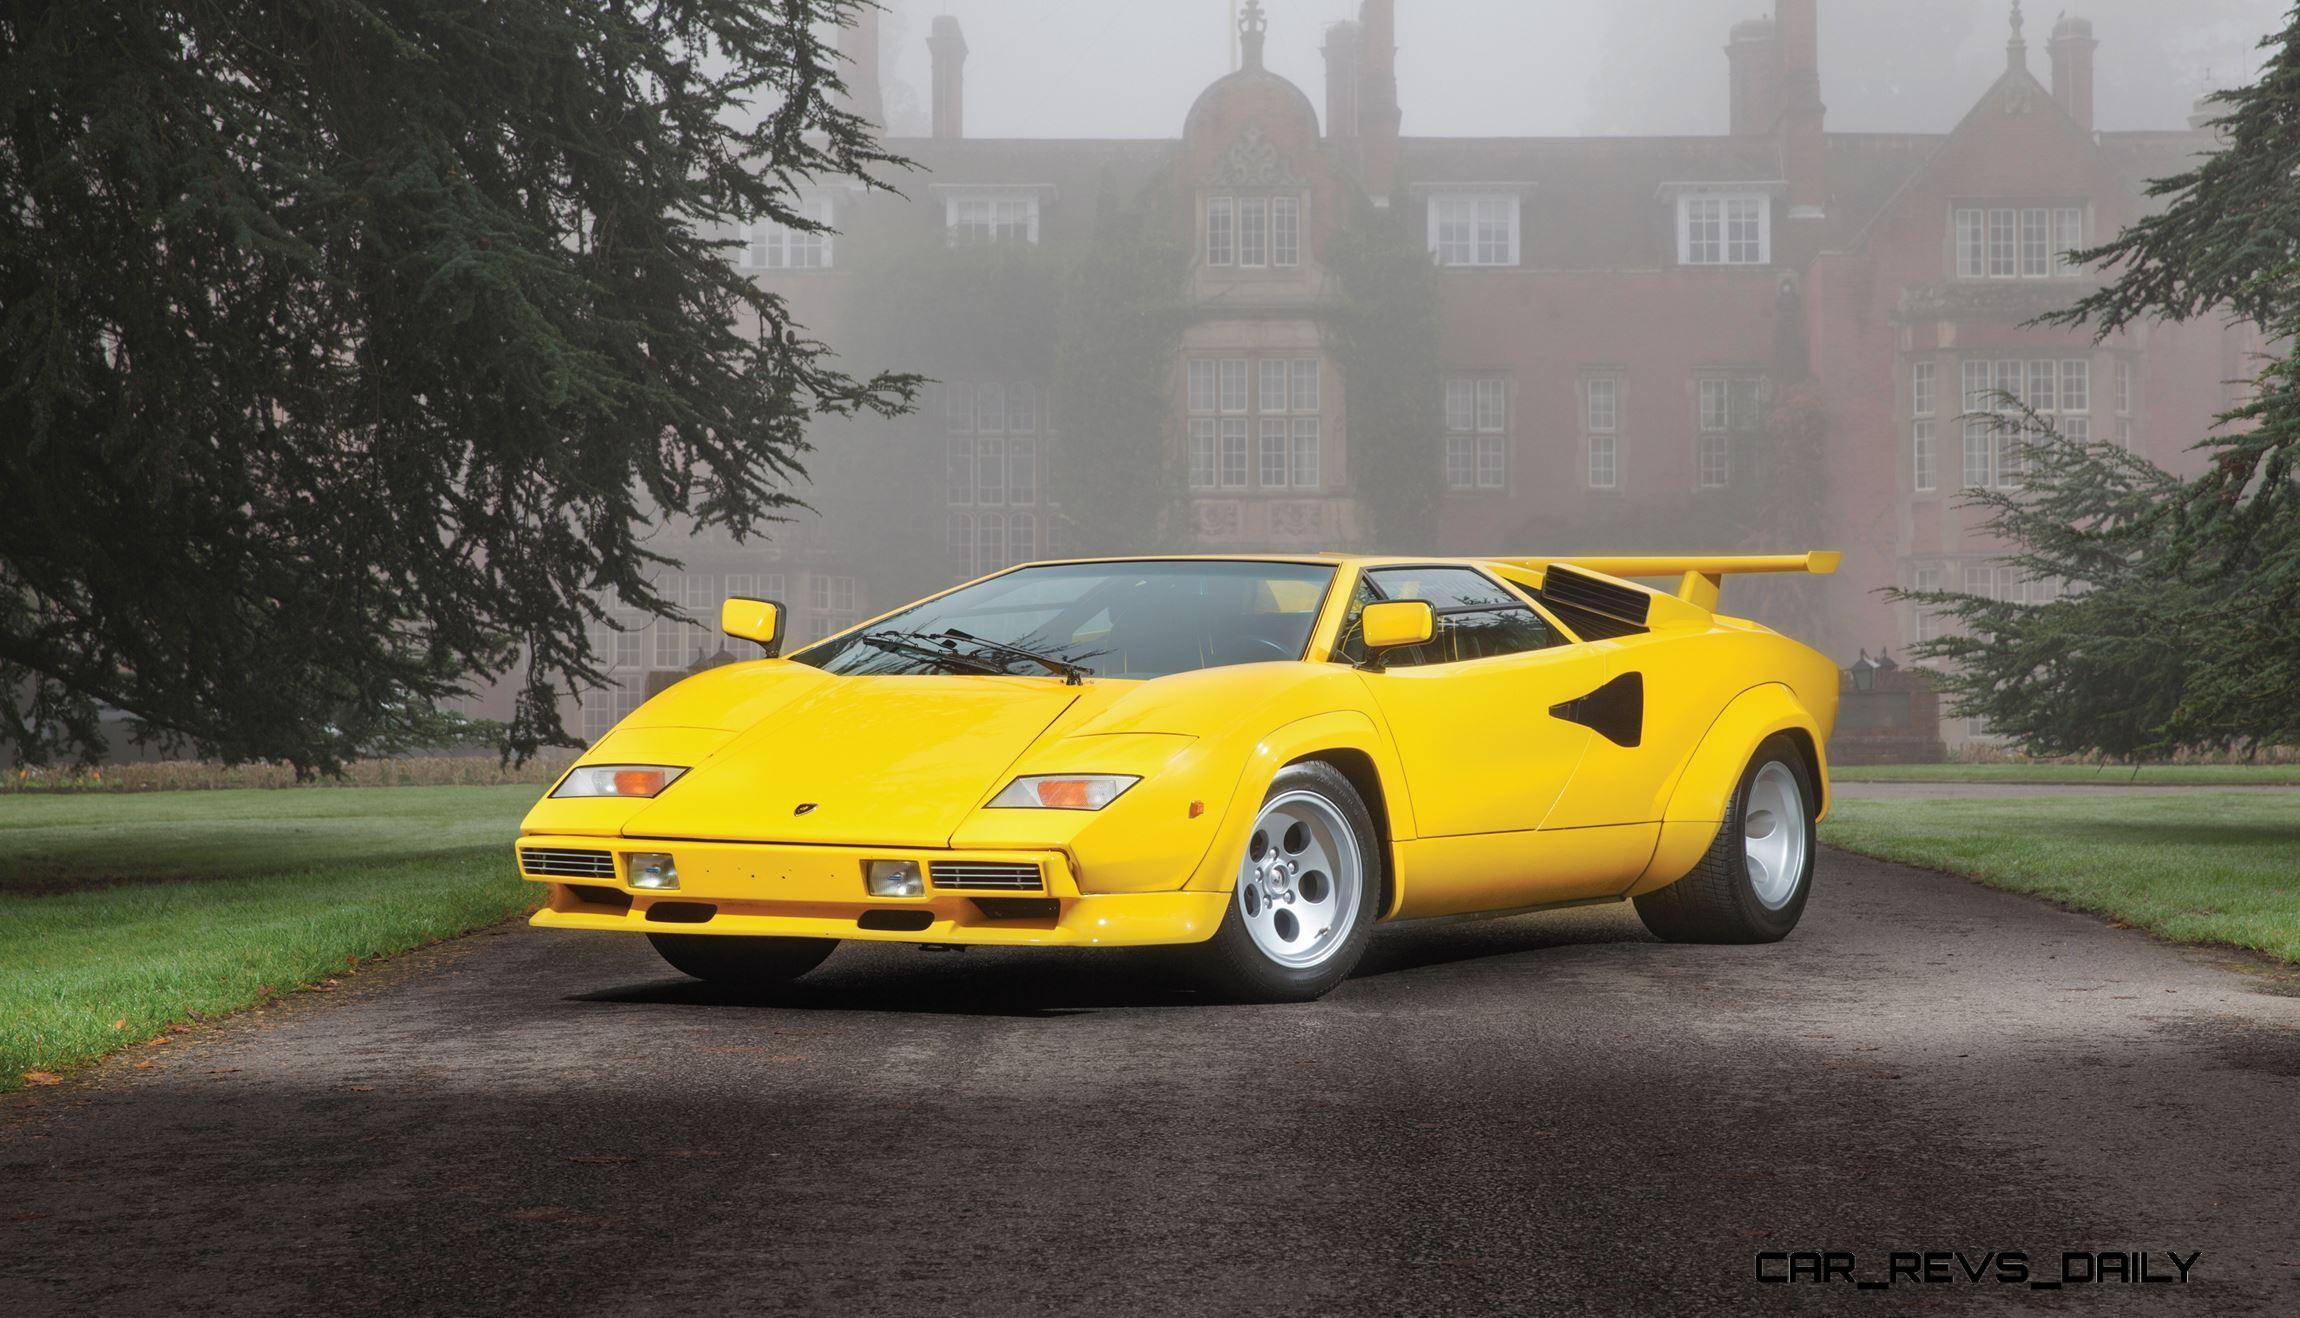 Rm Paris 2016 1981 Lamborghini Countach Lp400s Series